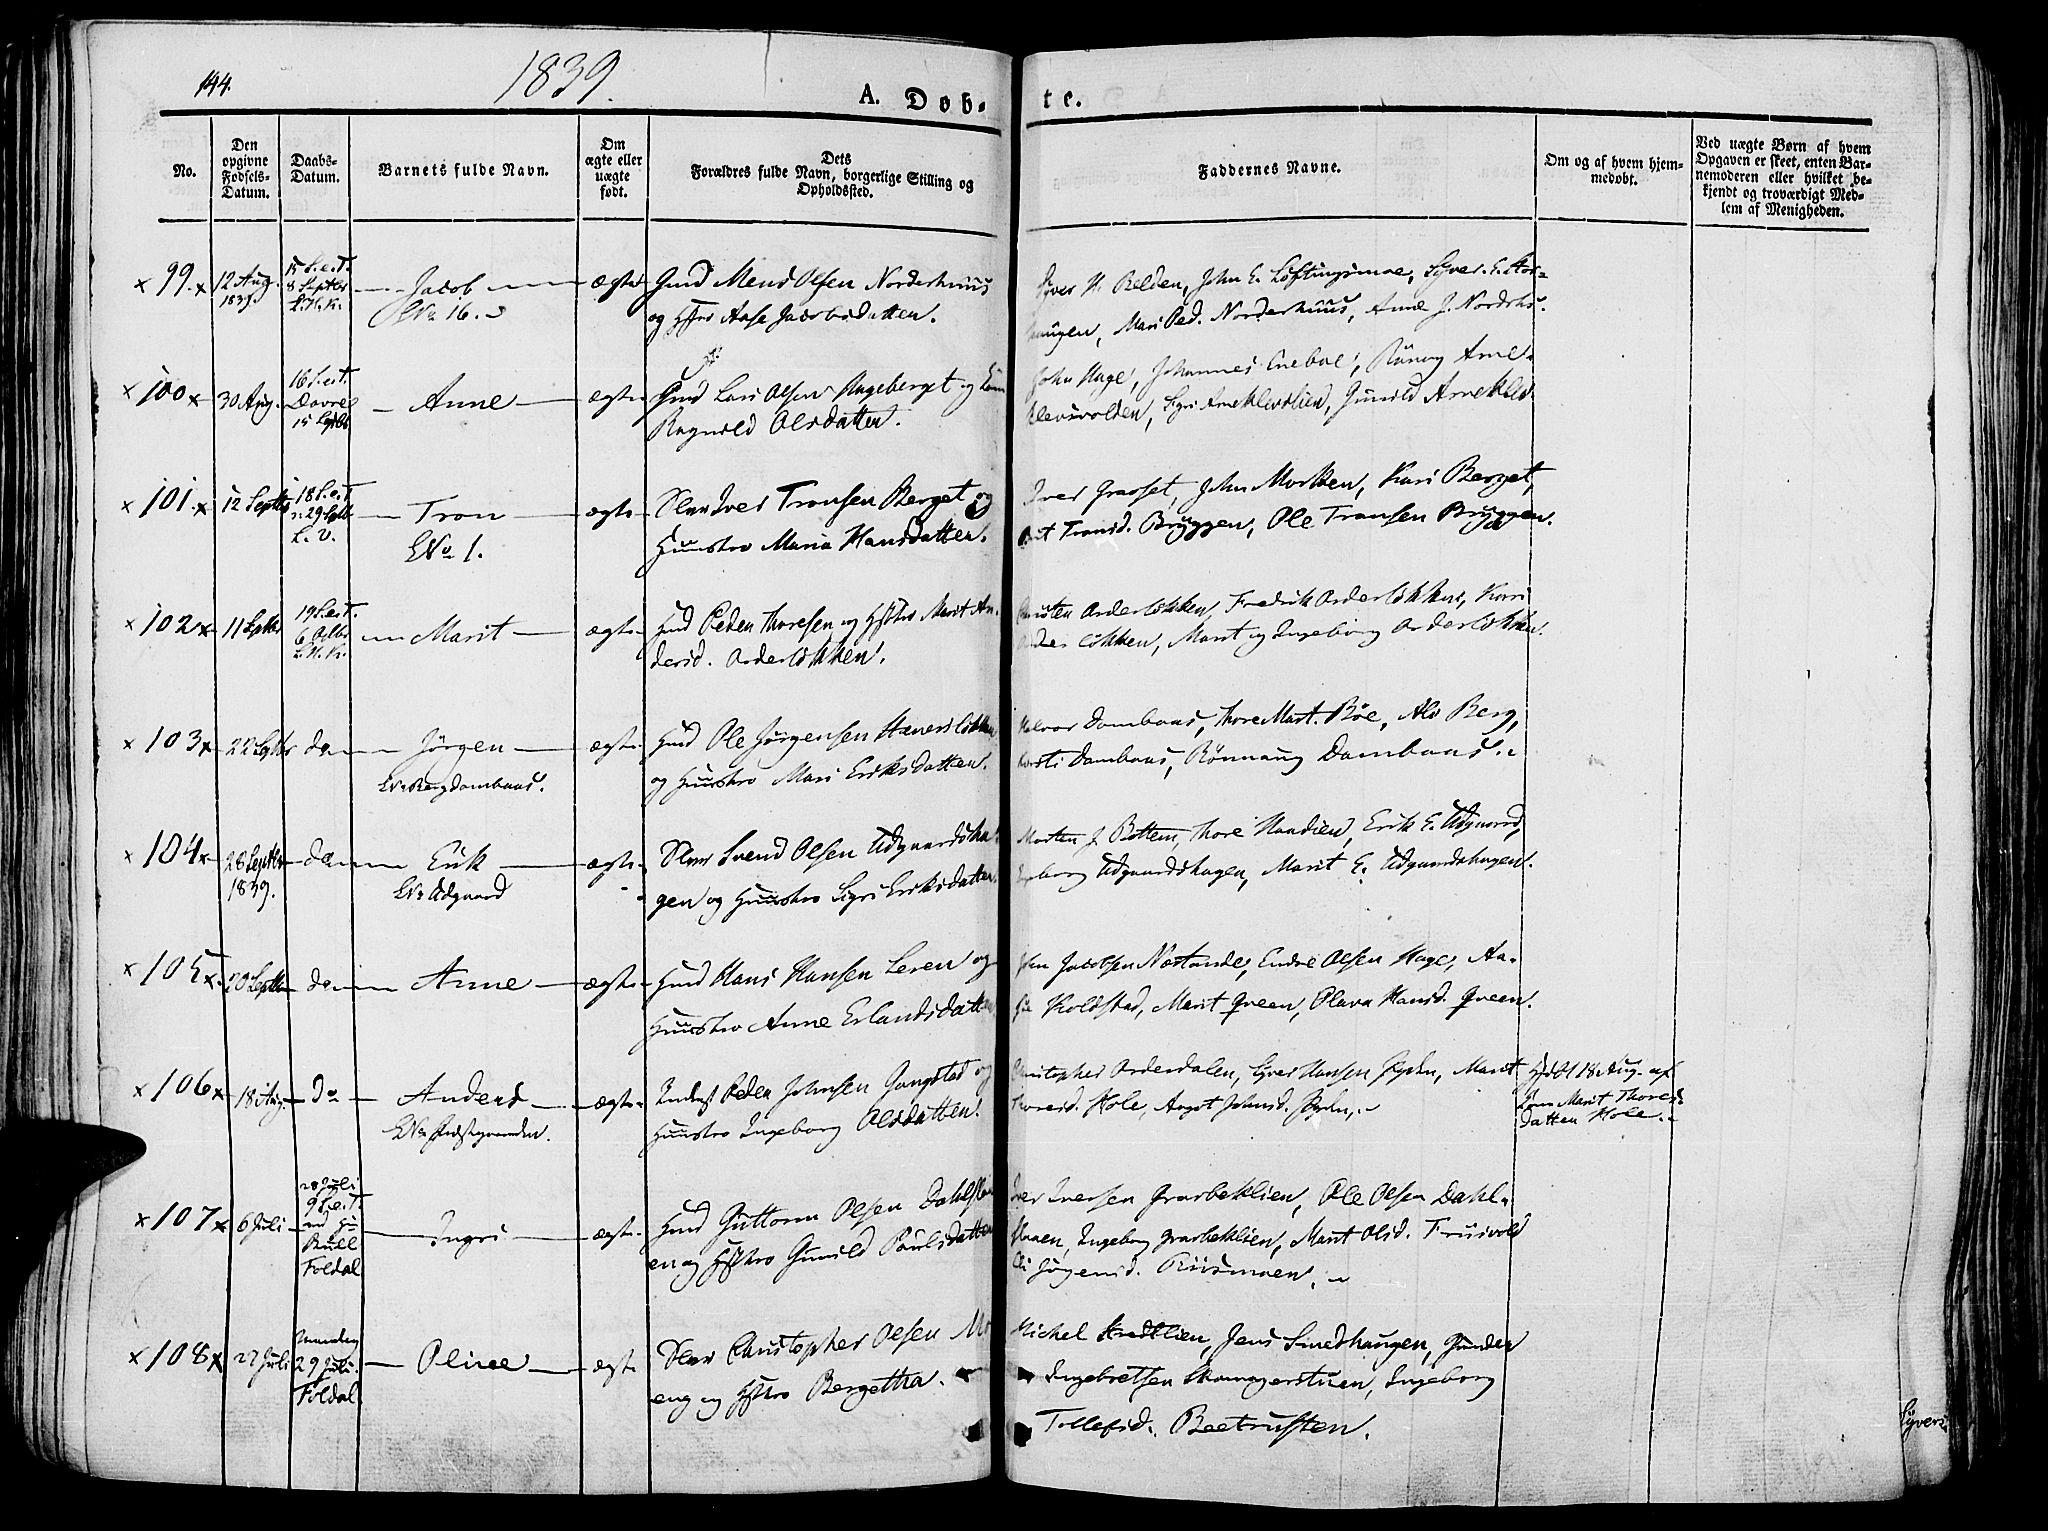 SAH, Lesja prestekontor, Ministerialbok nr. 5, 1830-1842, s. 144